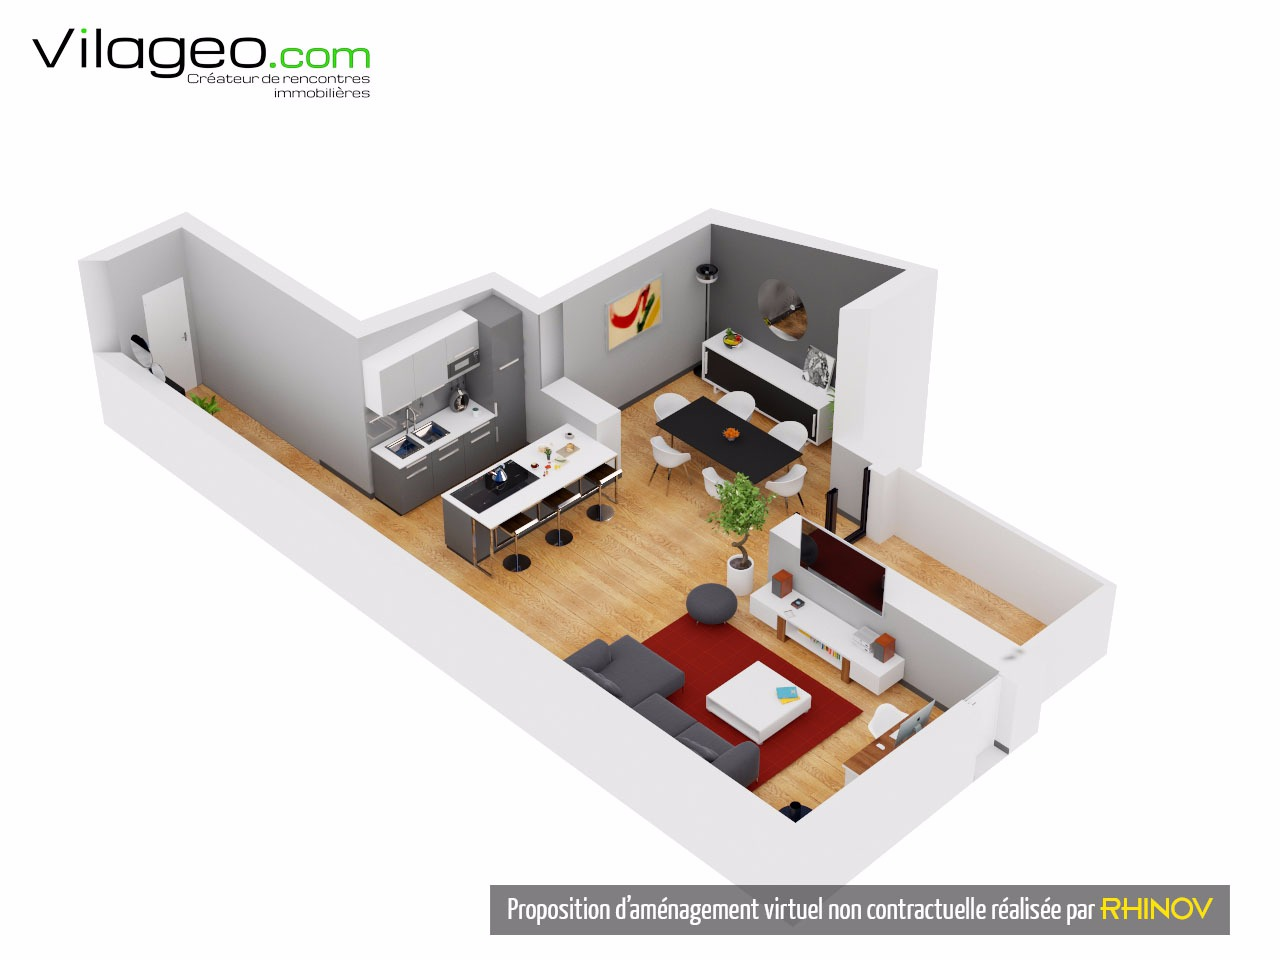 Appartement type loft 90m vilageo for Appartement type loft